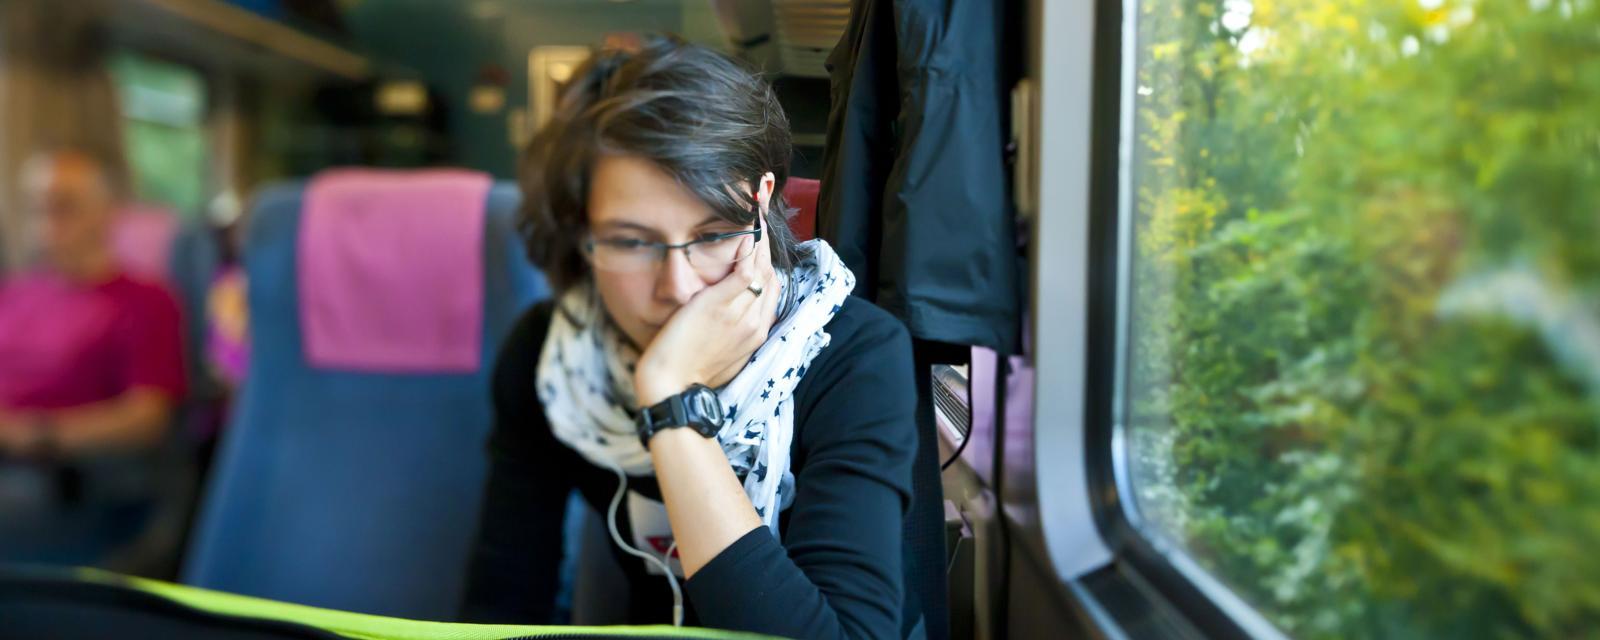 woman commuter train laptop